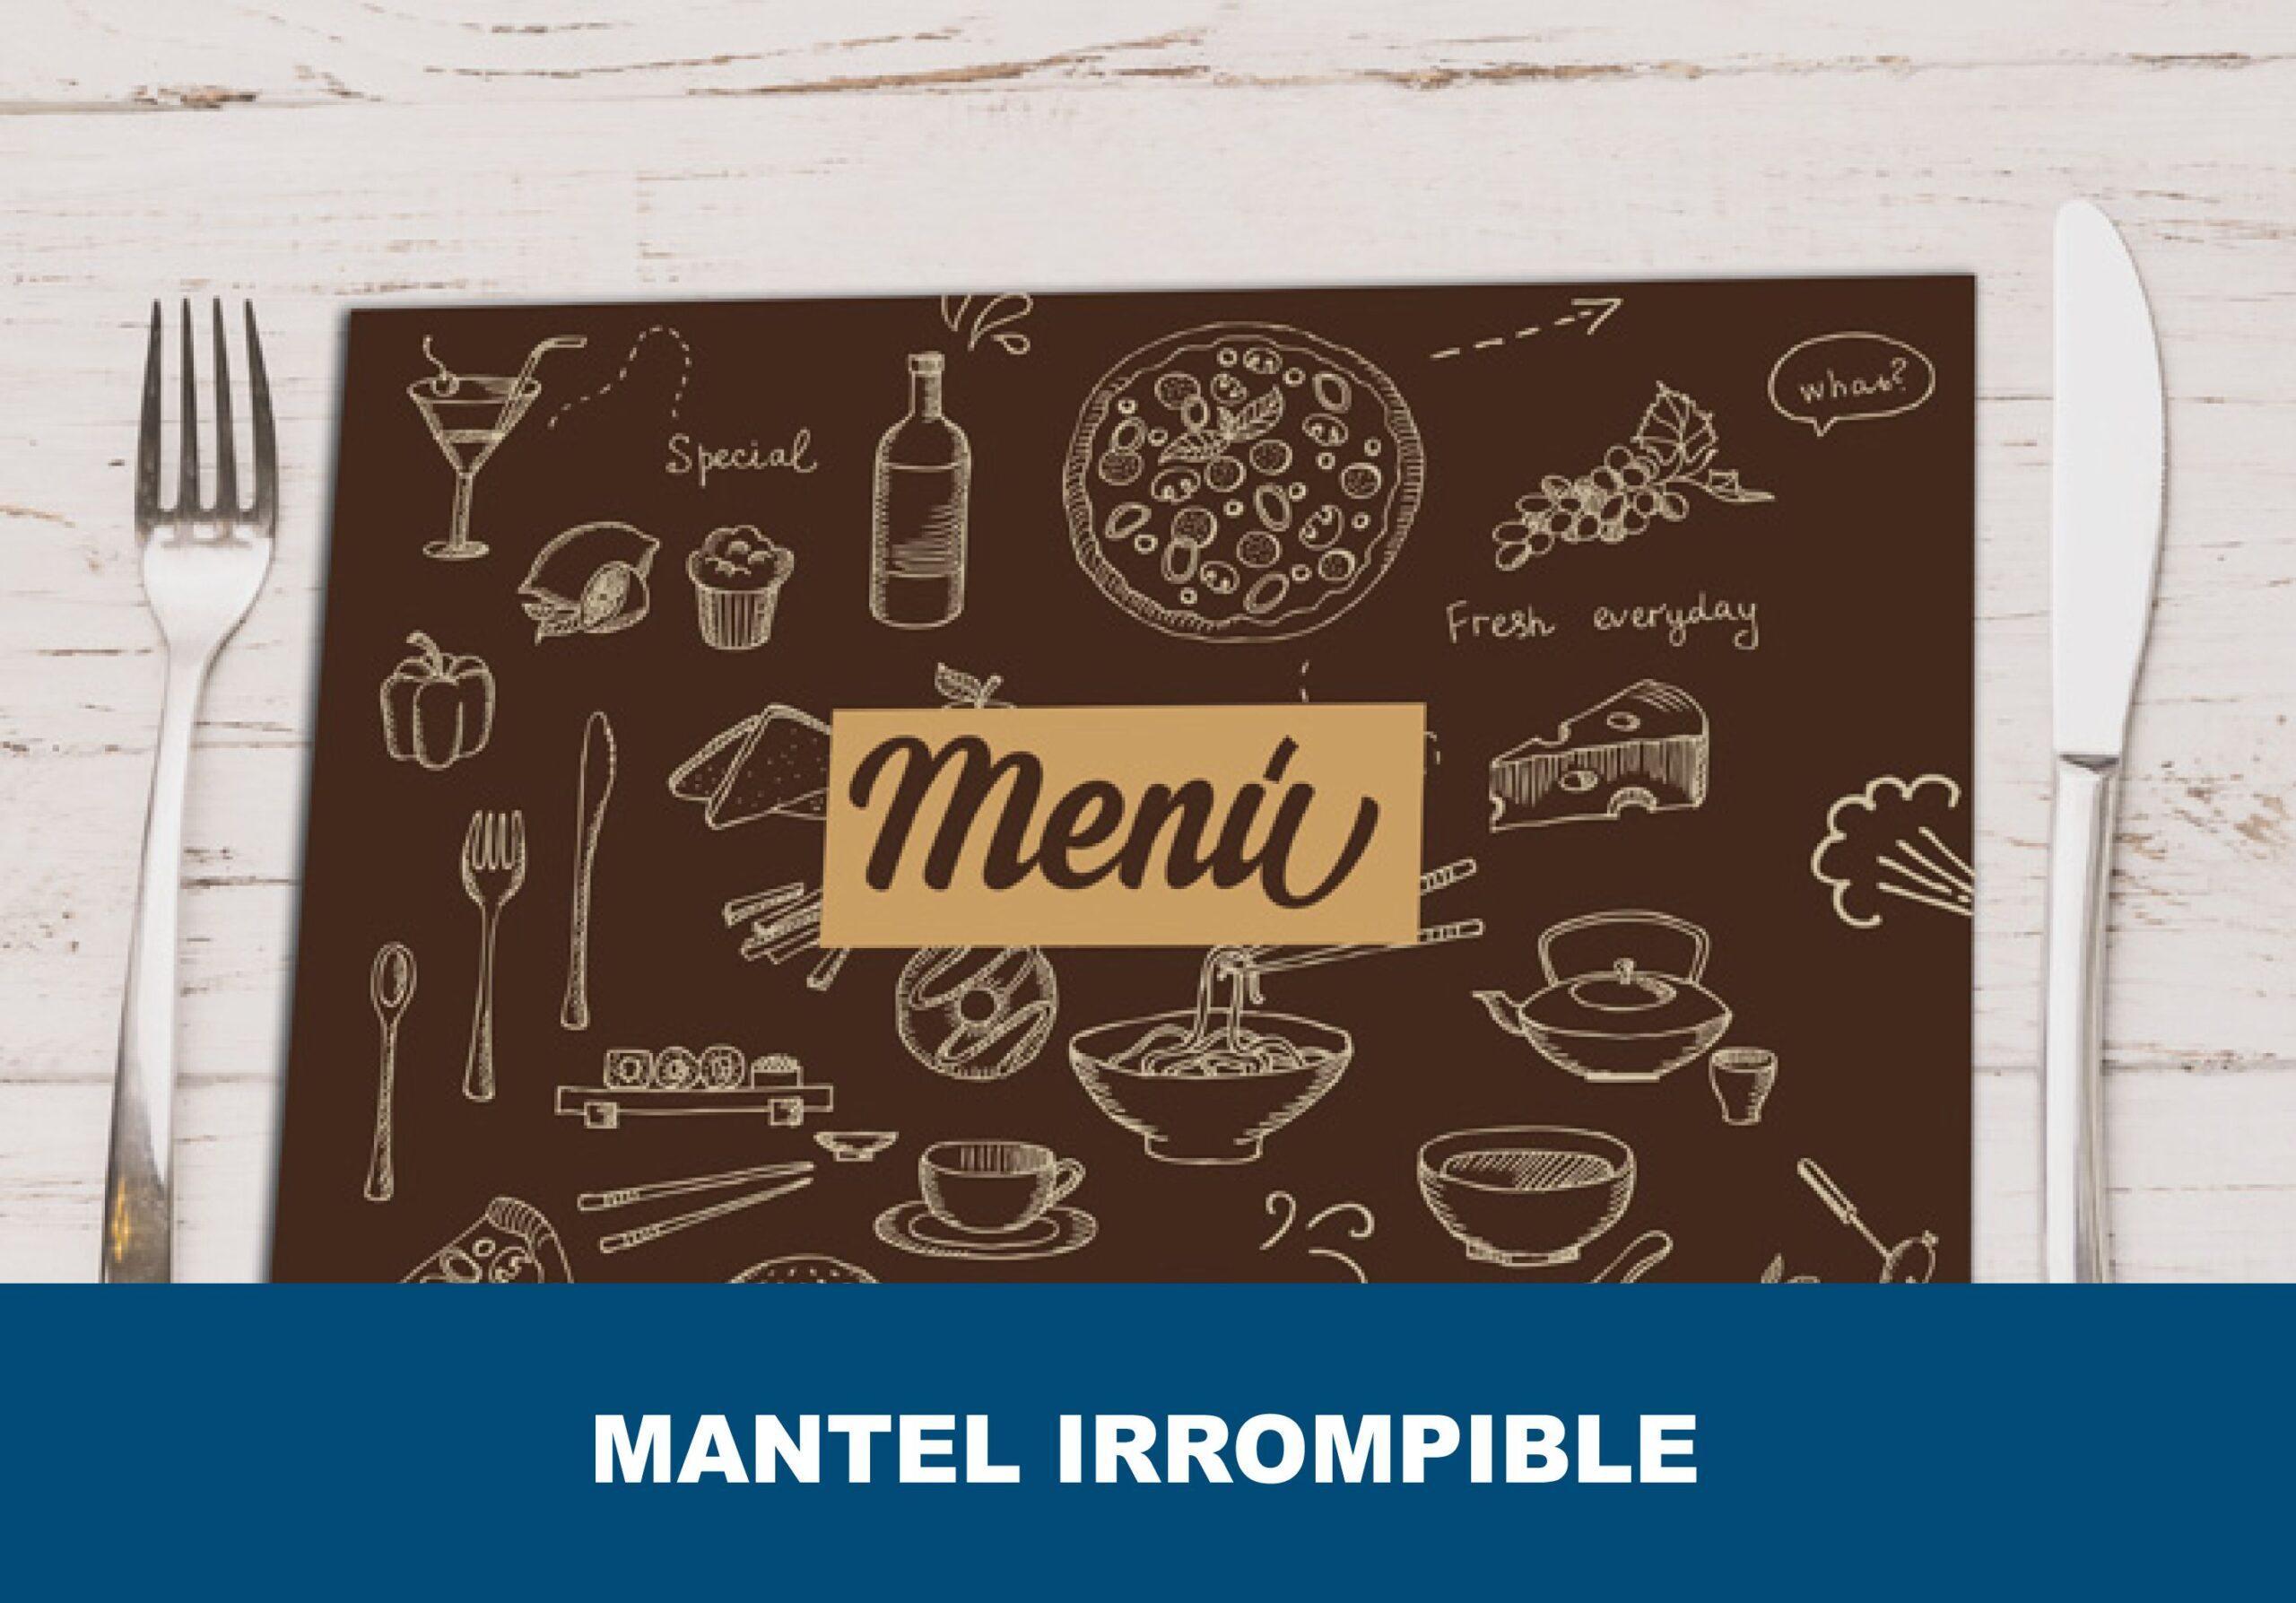 Mantel individual irrompible